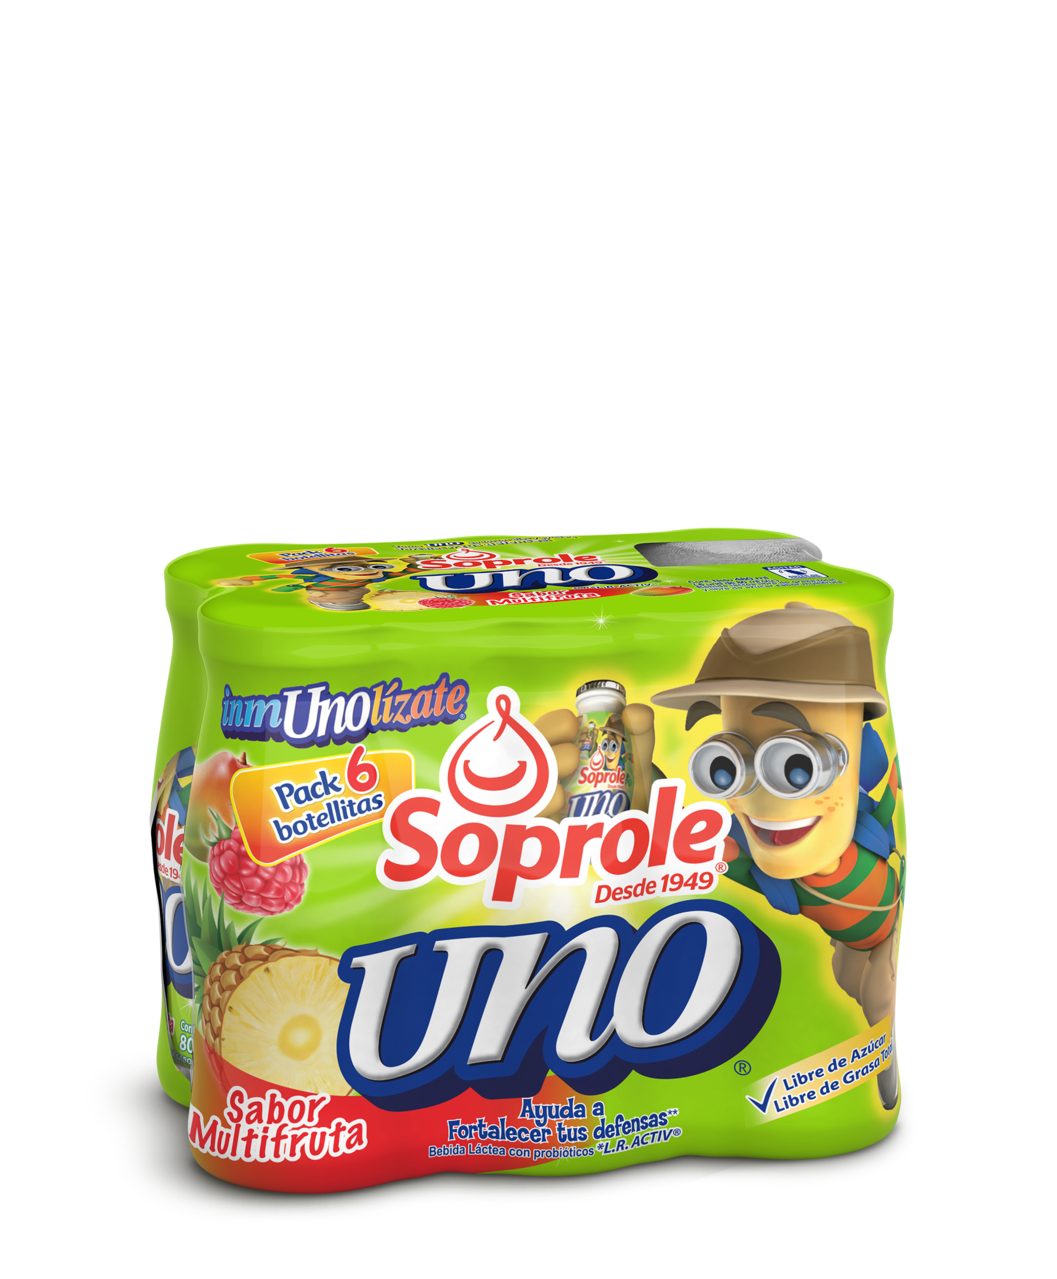 Soprole uno sabor multifruta pack 6